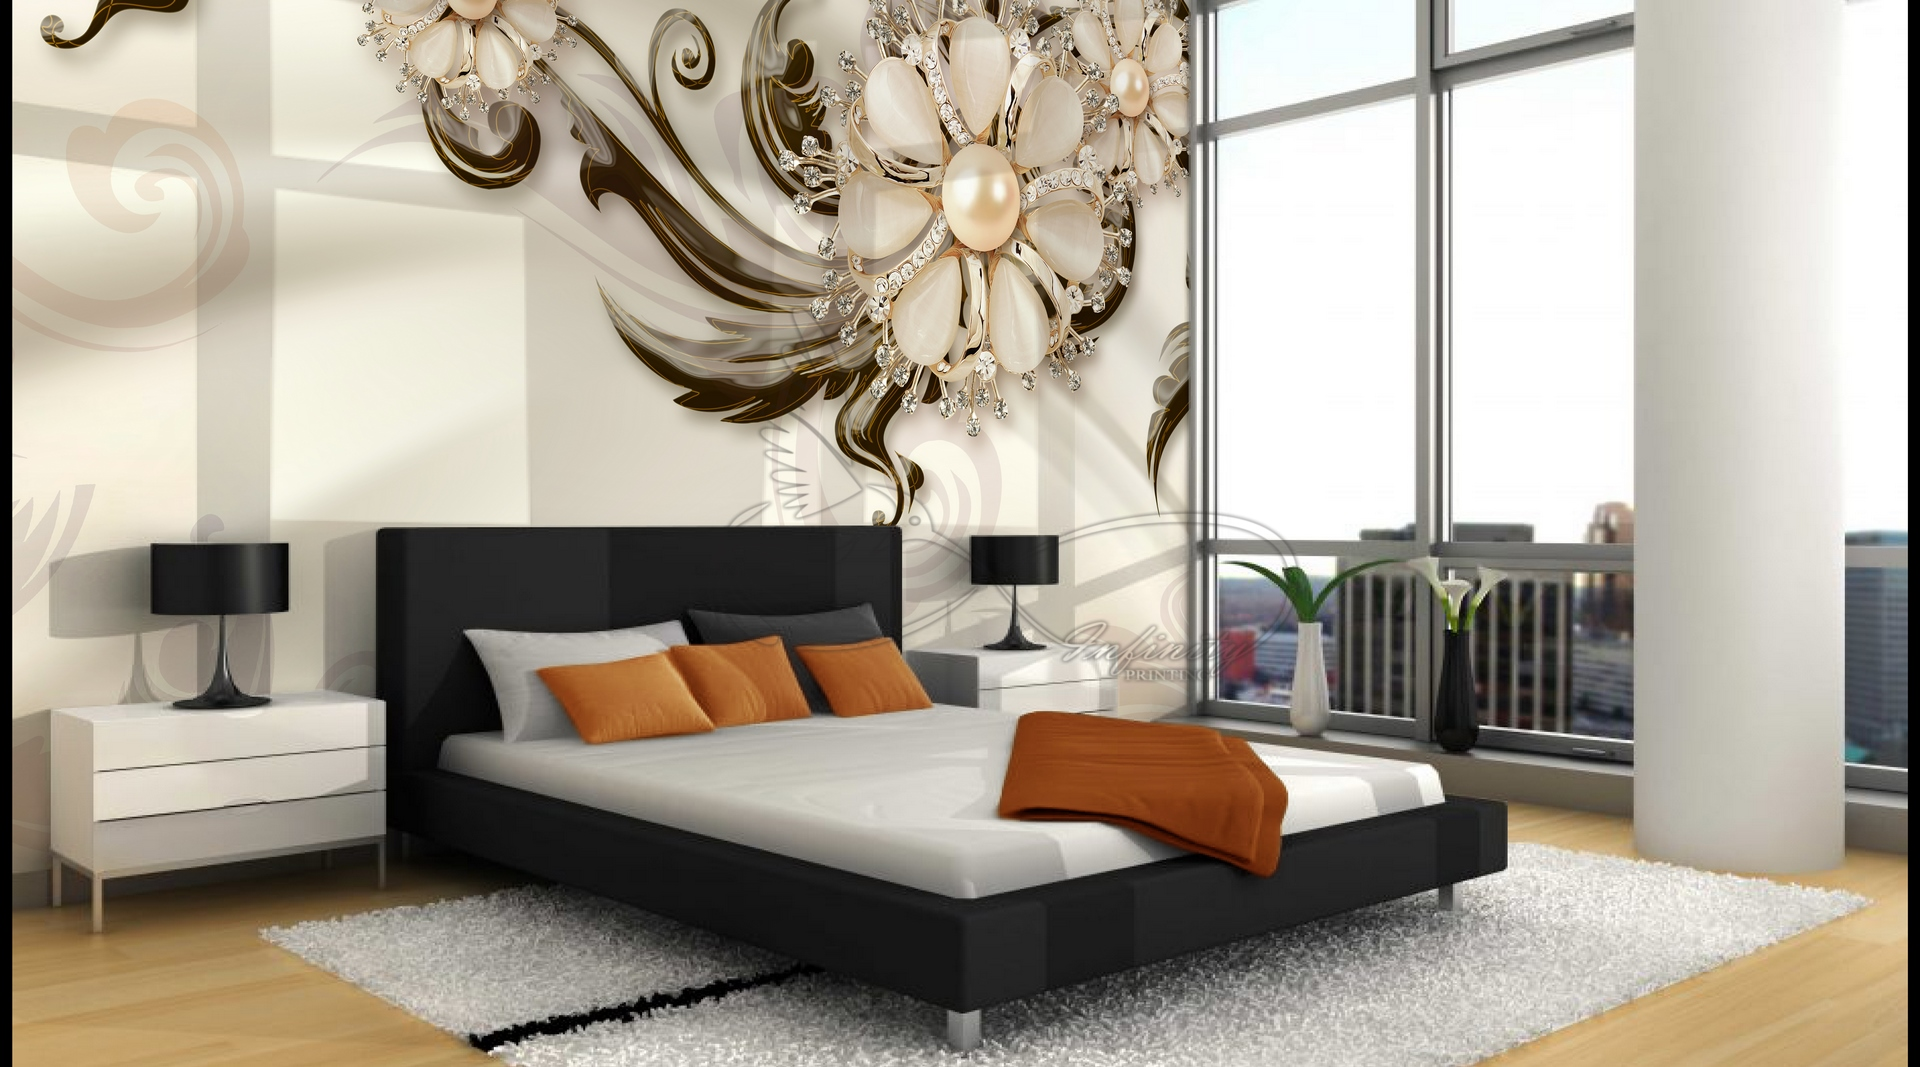 Free Mokap Open Layer Design Living Room Background No. 55